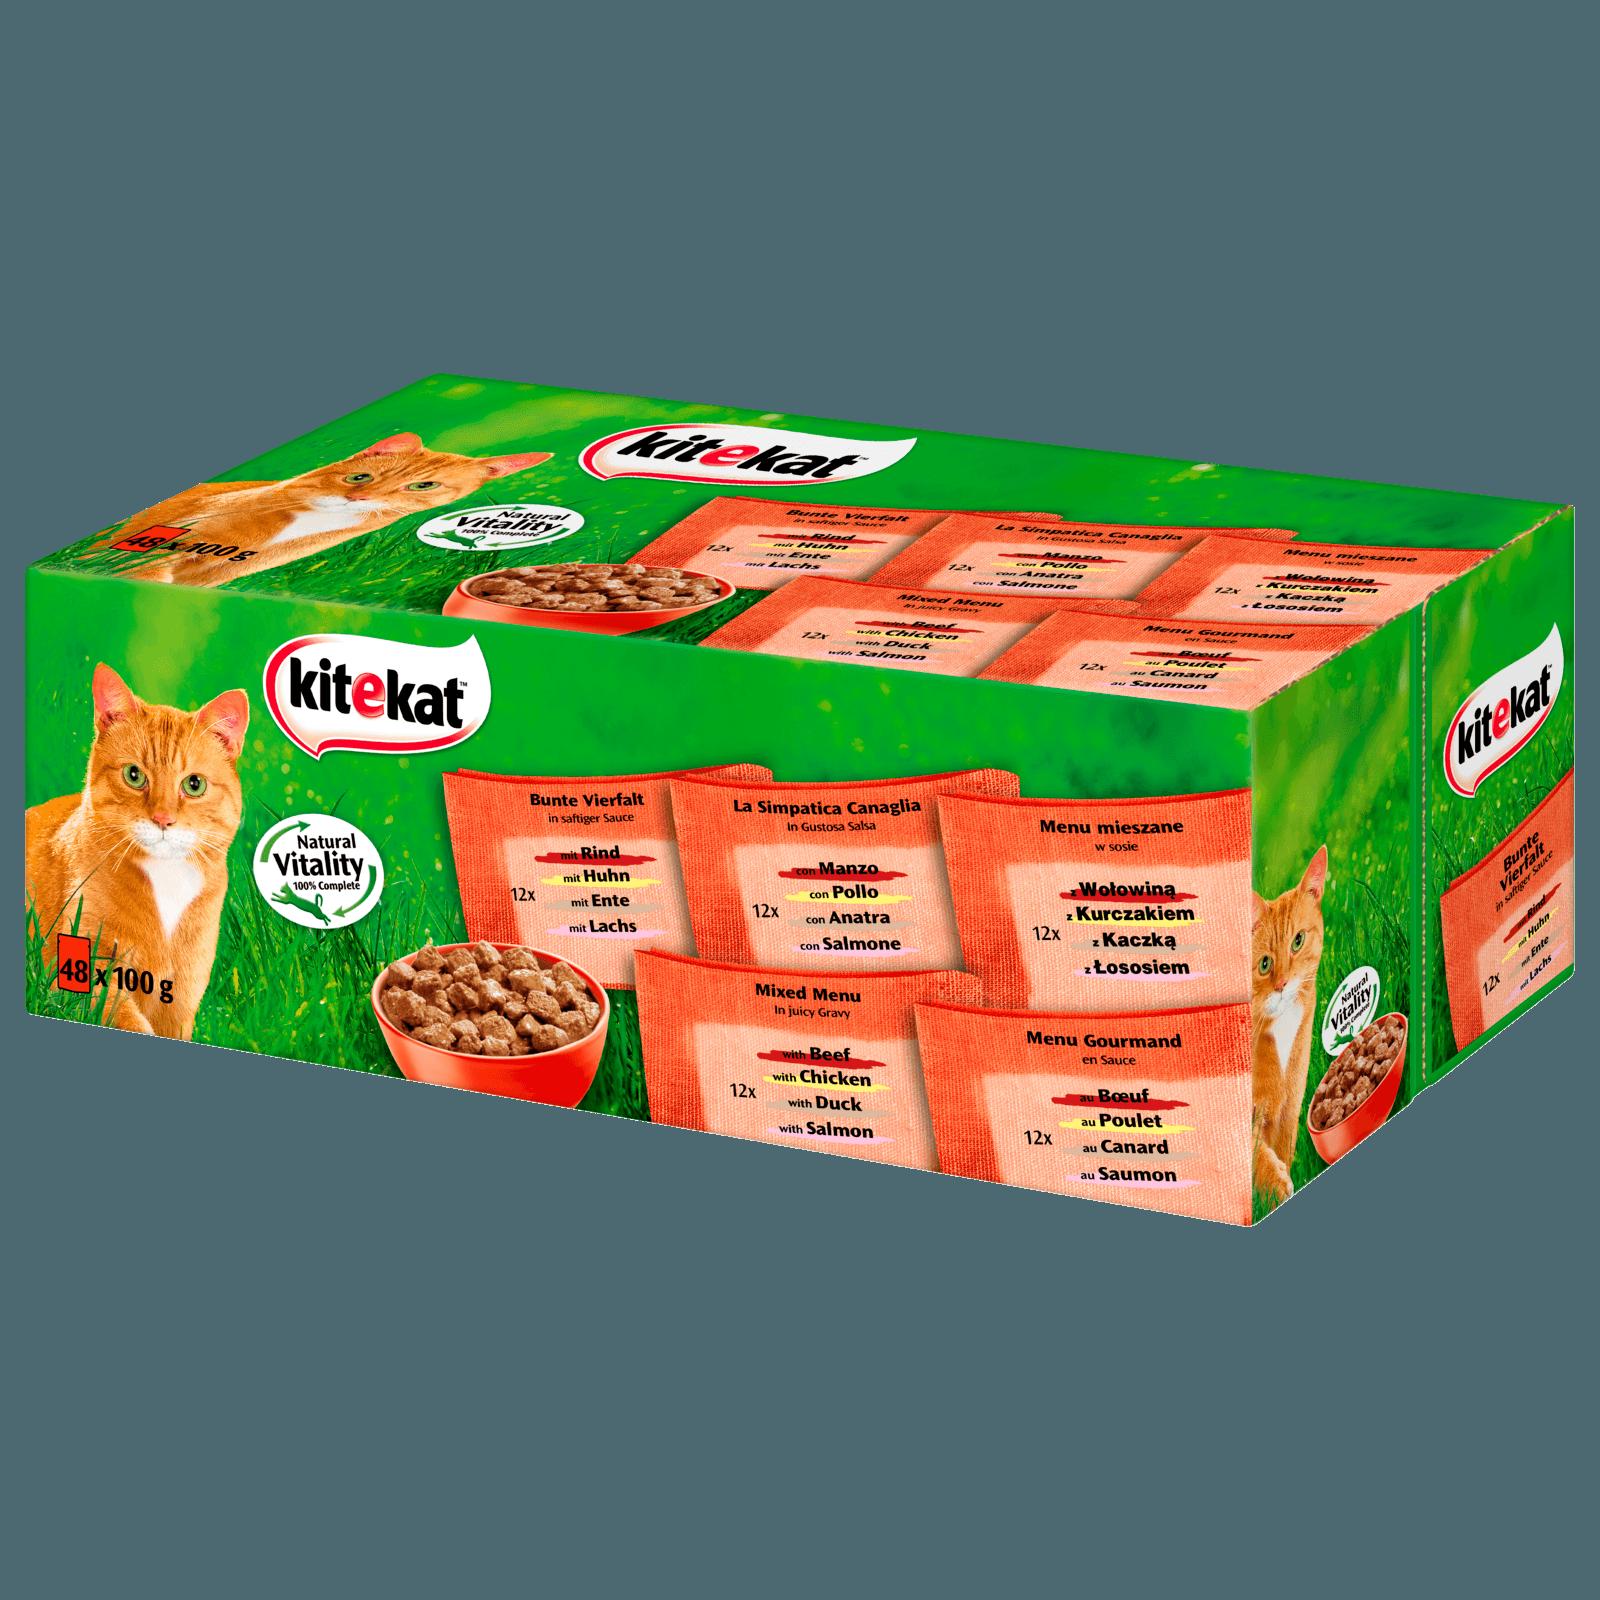 Kitekat Katzenfutter Bunte Vierfalt in Sauce 48x100g